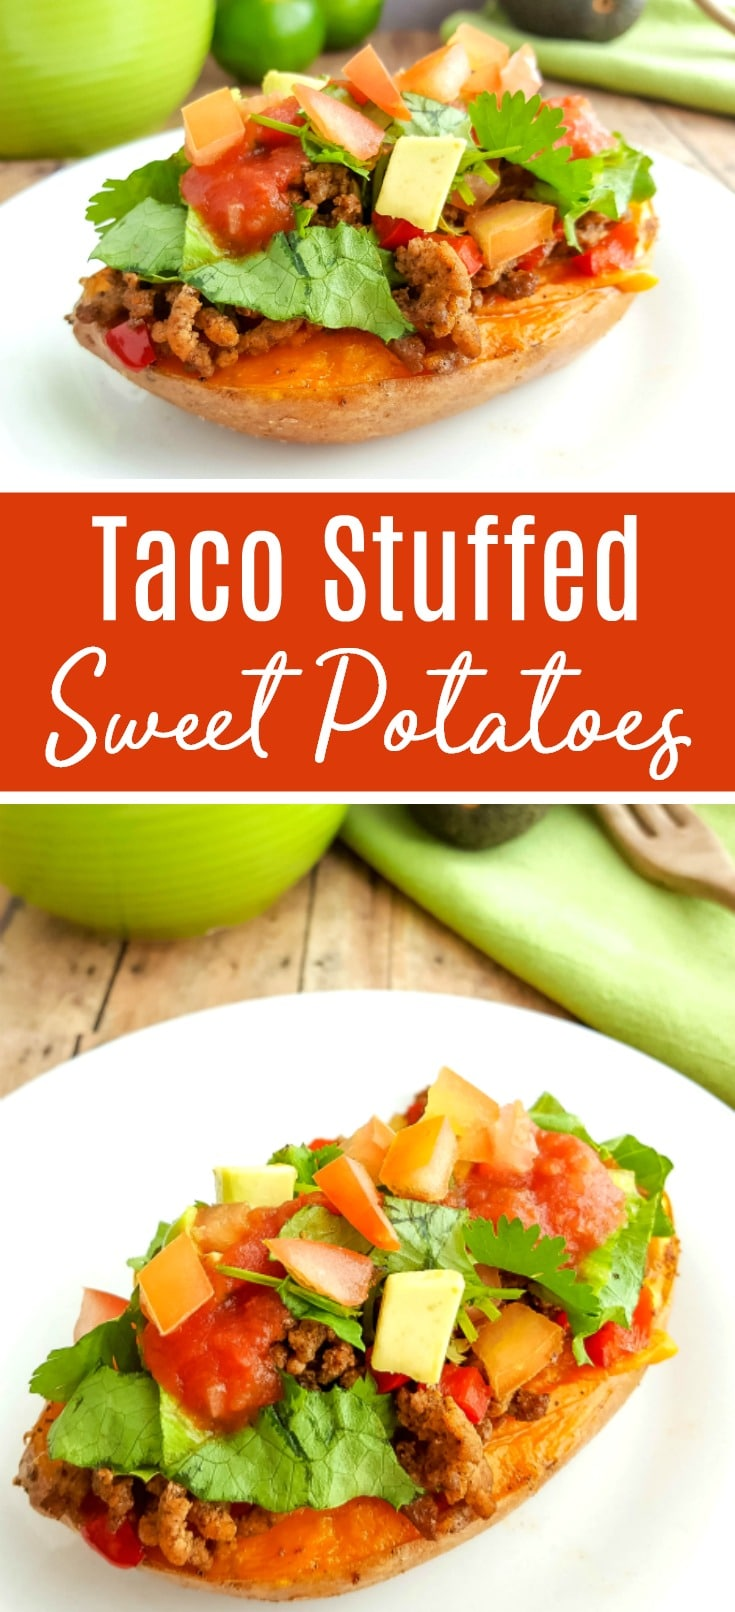 taco stuffed sweet potatoes recipe whole30 taco sweet potato